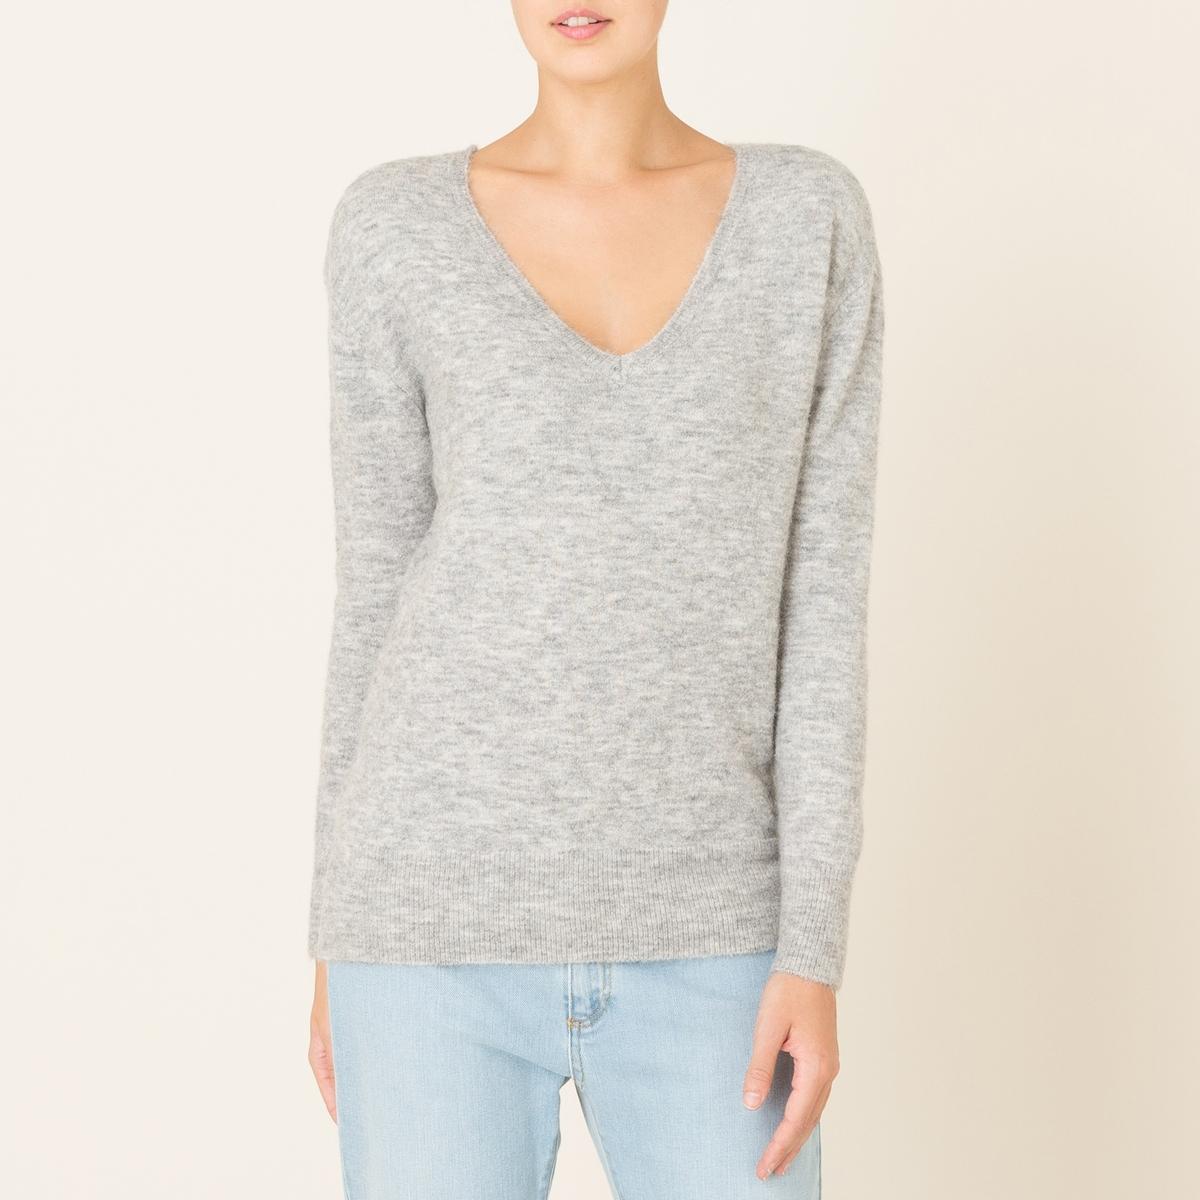 Пуловер TERIYAKIСостав и описание Материал : 42% шерсти, 42% полиамида, 14% альпаки, 2% эластана.Марка : HARRIS WILSON<br><br>Цвет: серый